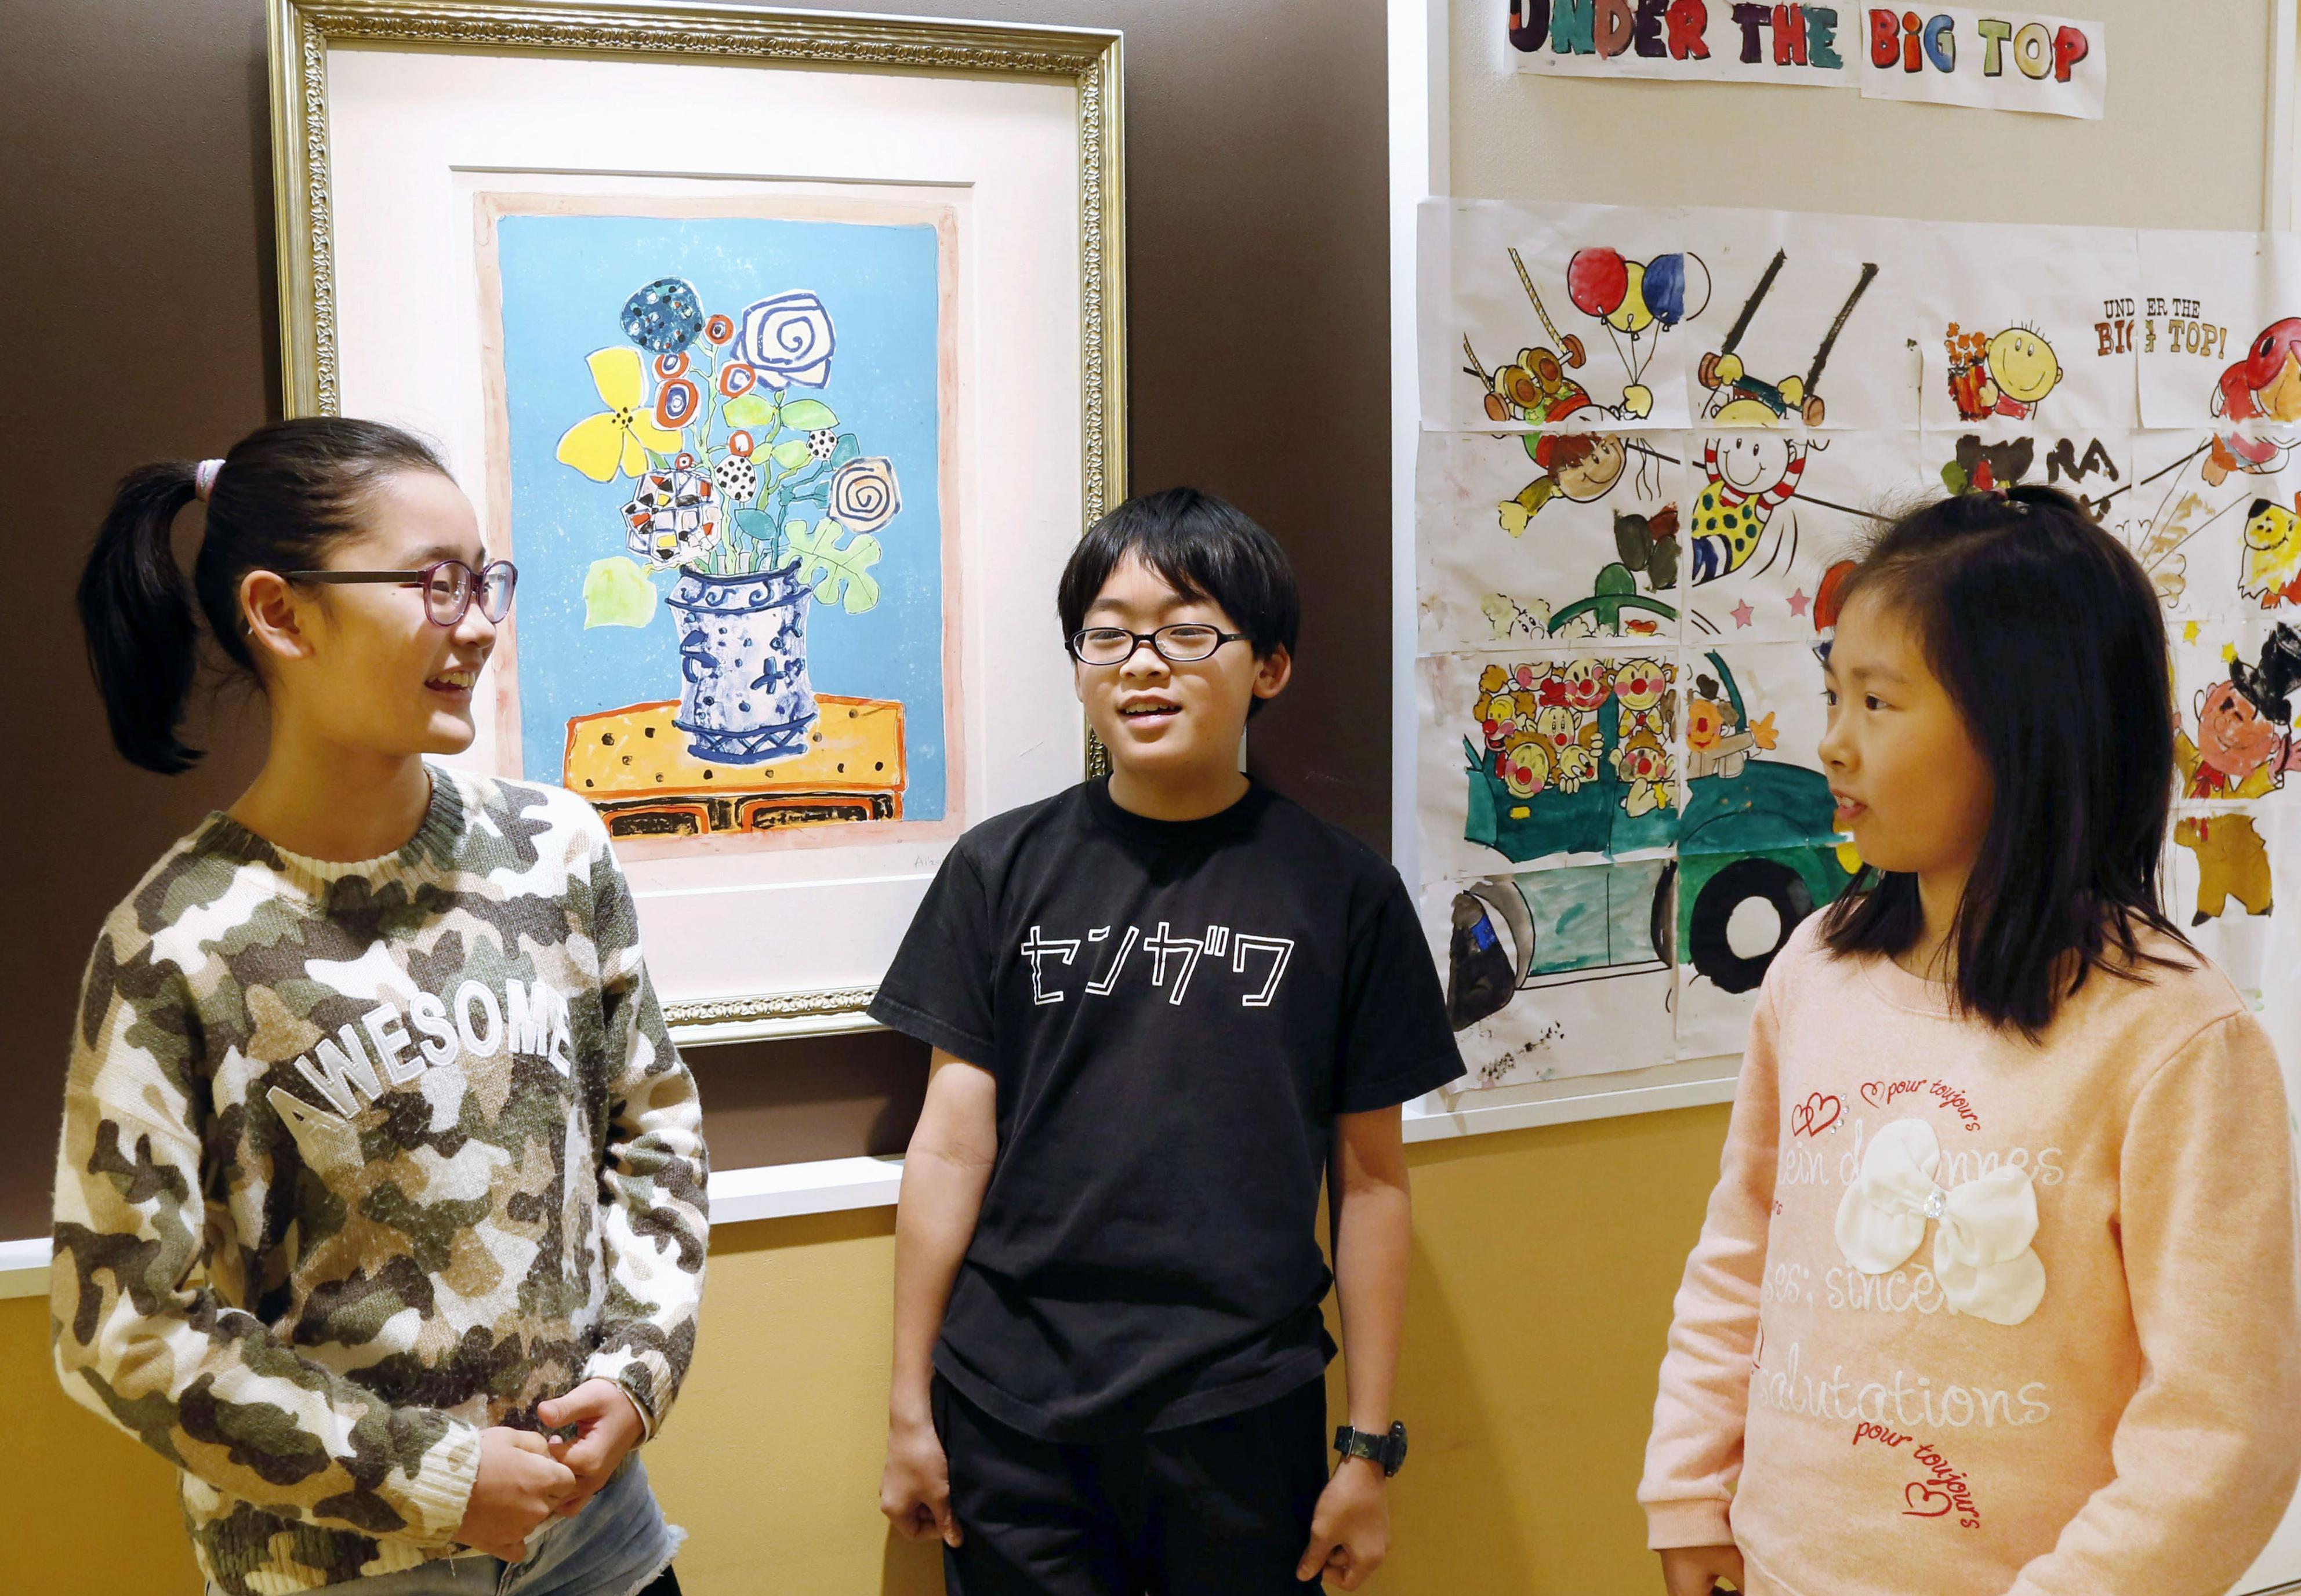 LCA国際小学校の校舎内に飾られた絵画の前で談笑する桜田麗実菜(左)ら=相模原市